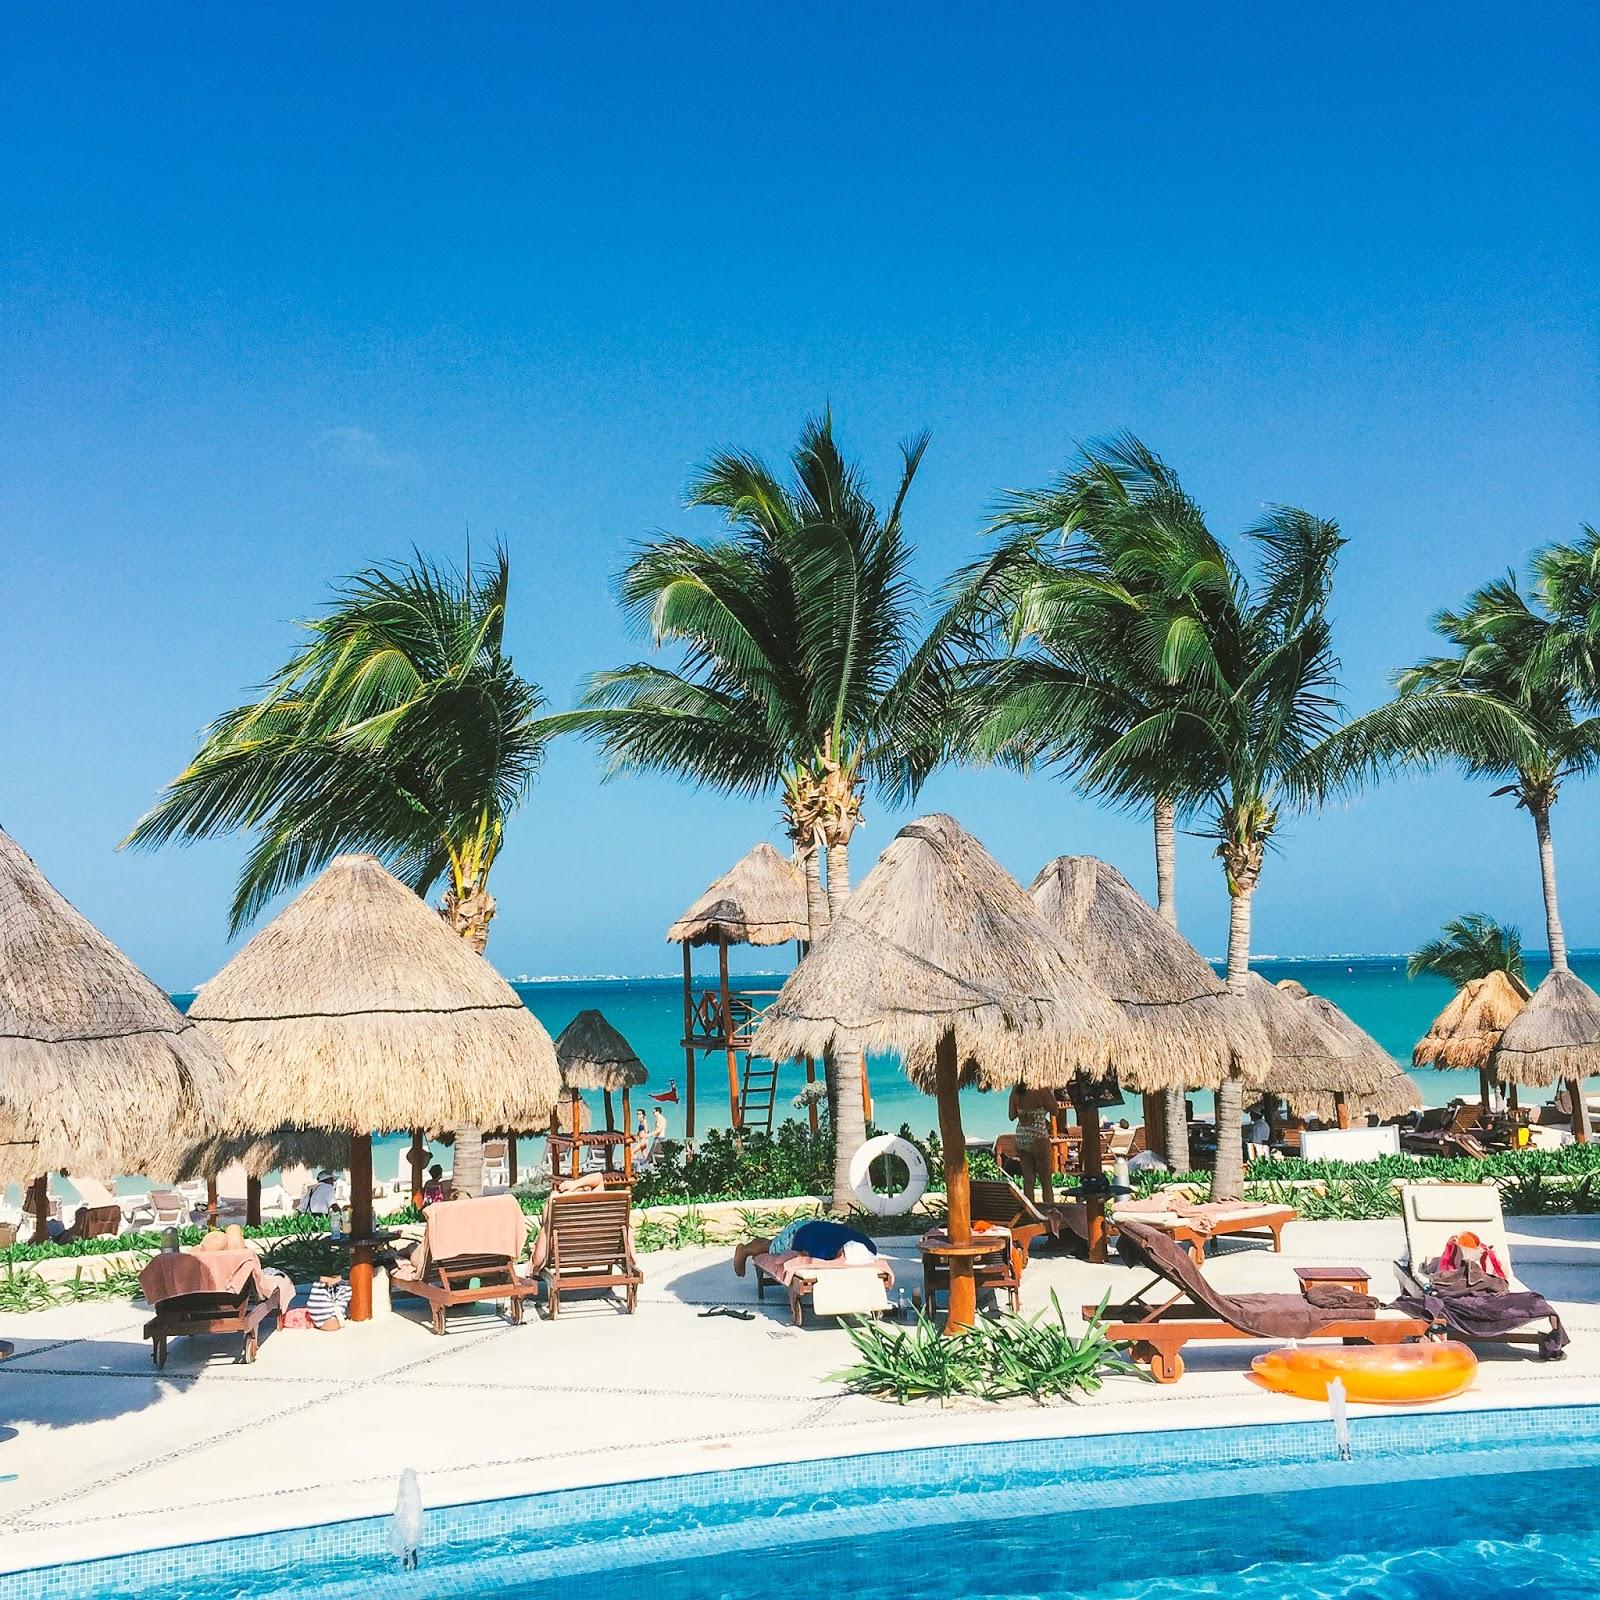 excellence resort playa mujeres reviews